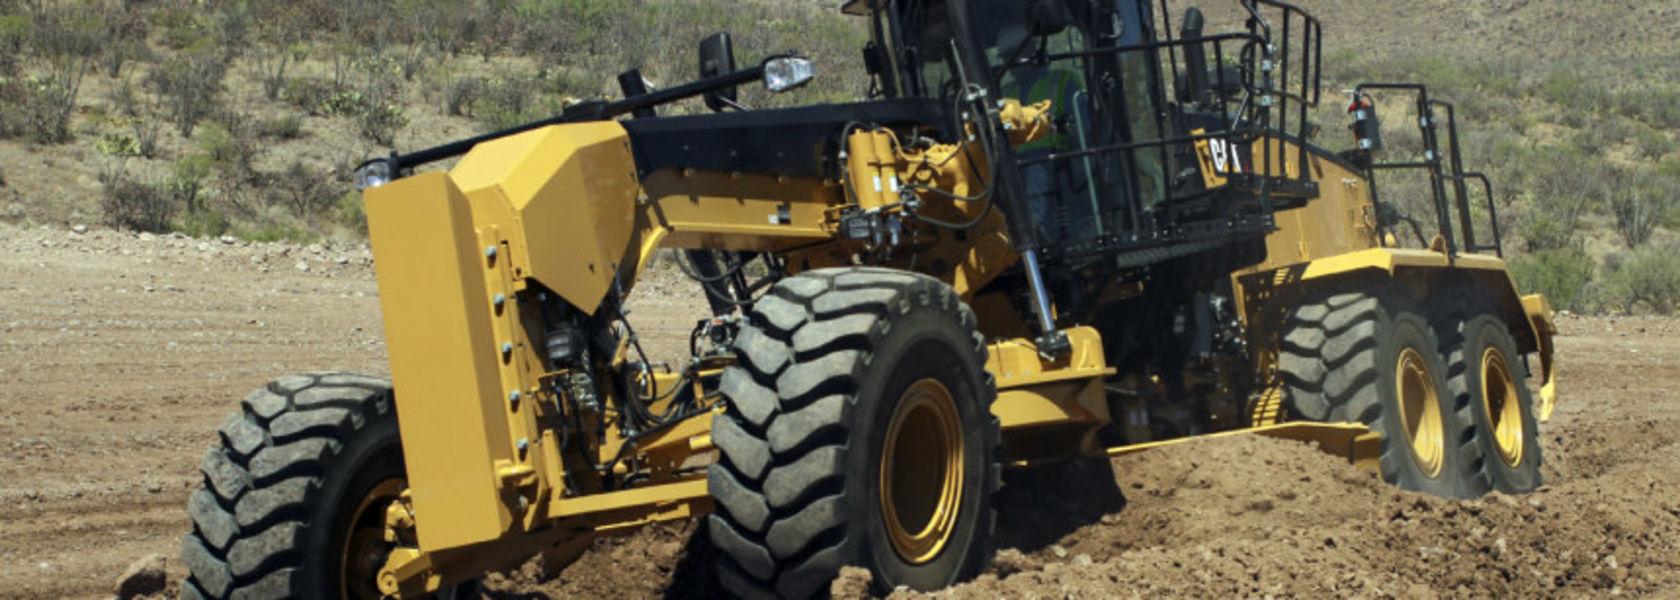 Caterpillar releases motor grader - Mining Magazine